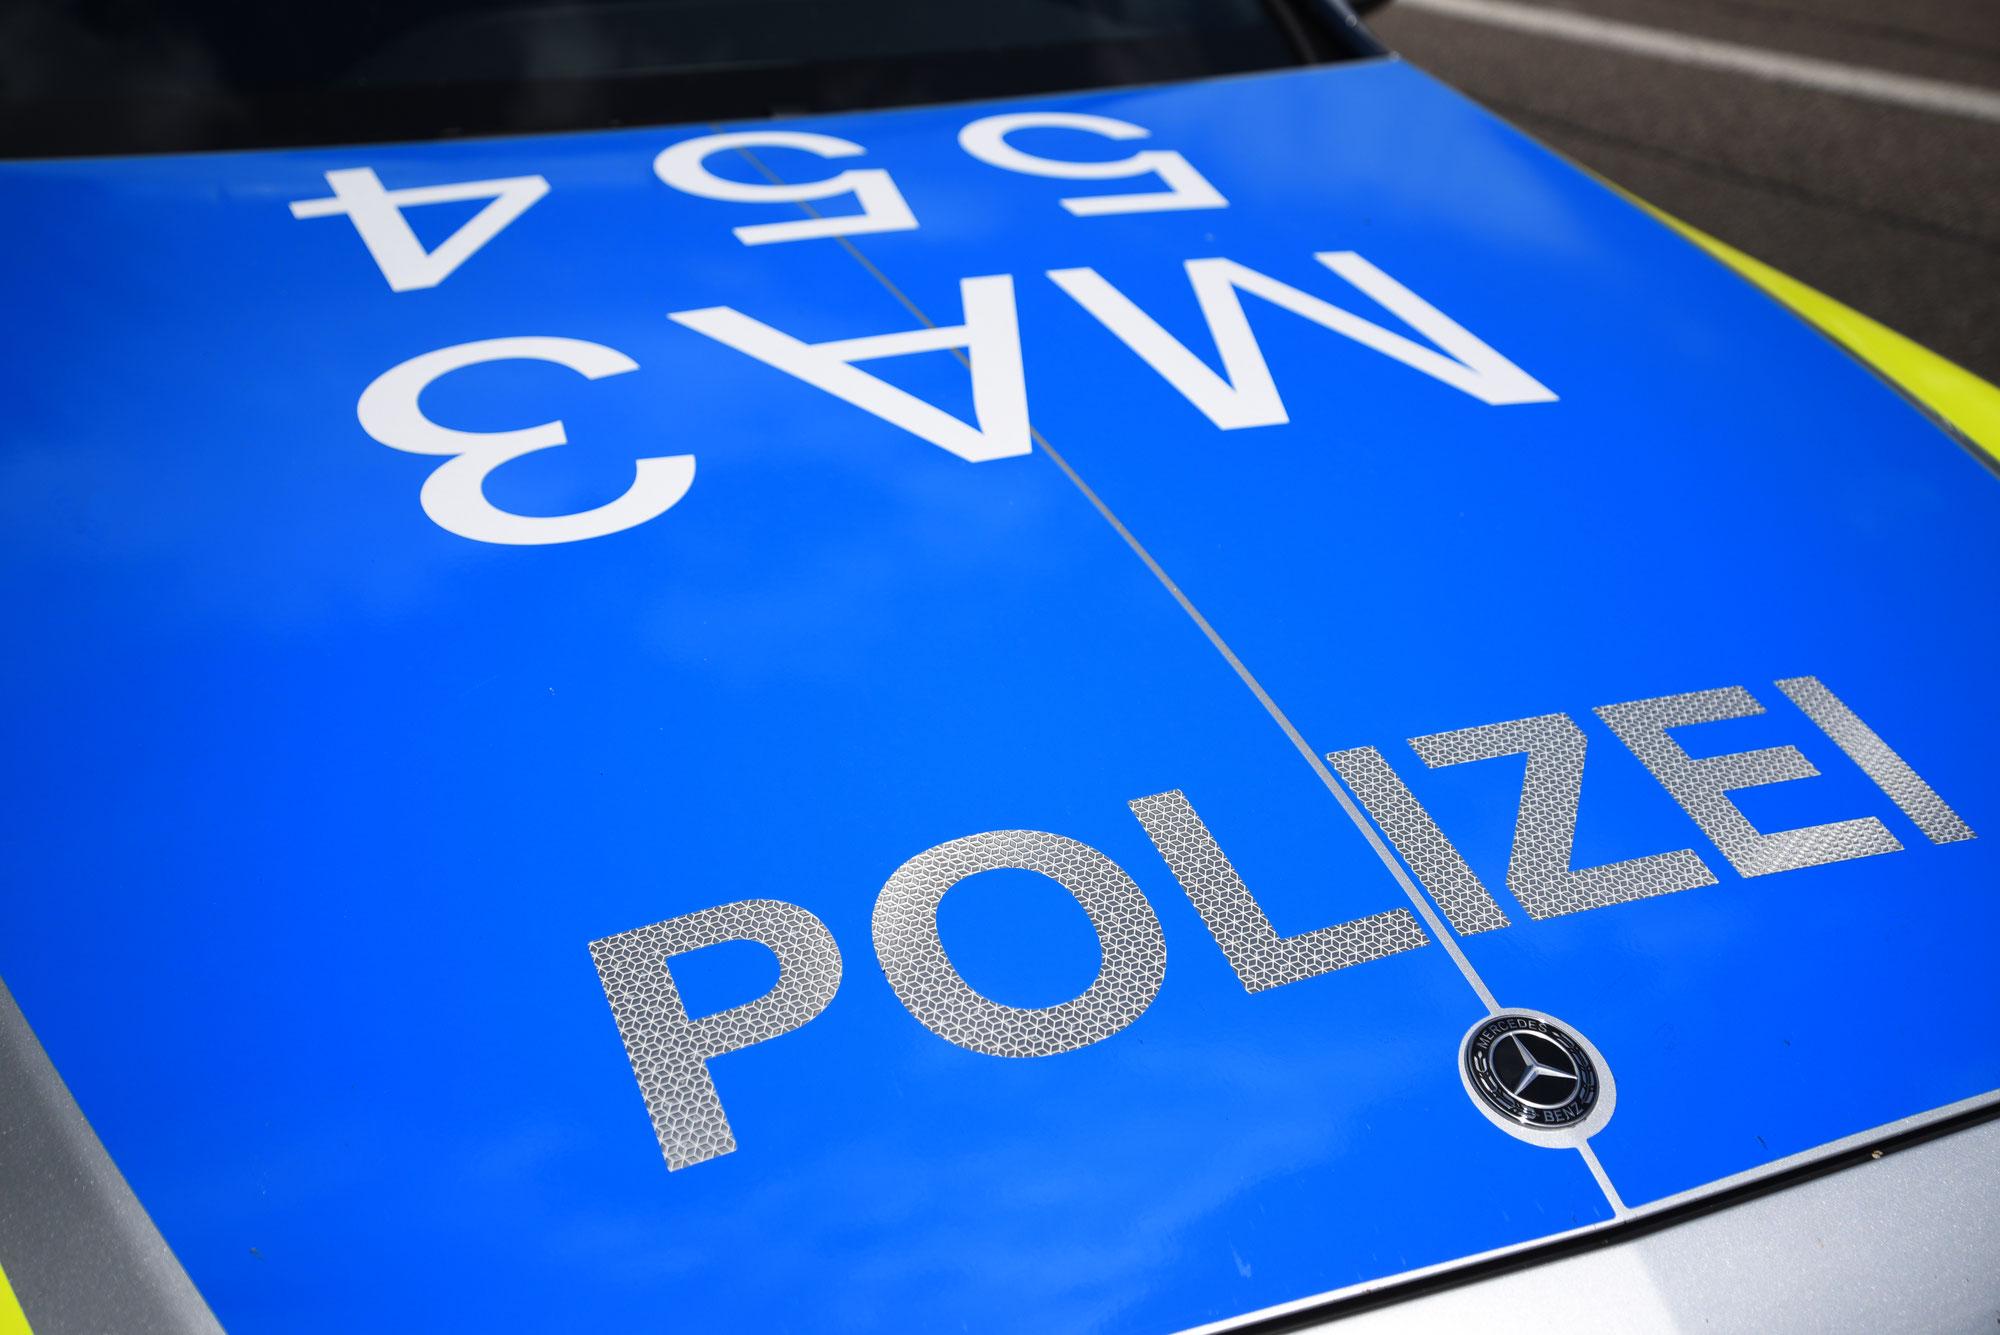 Mannheim-Käfertal: illegale Spielhalle entdeckt